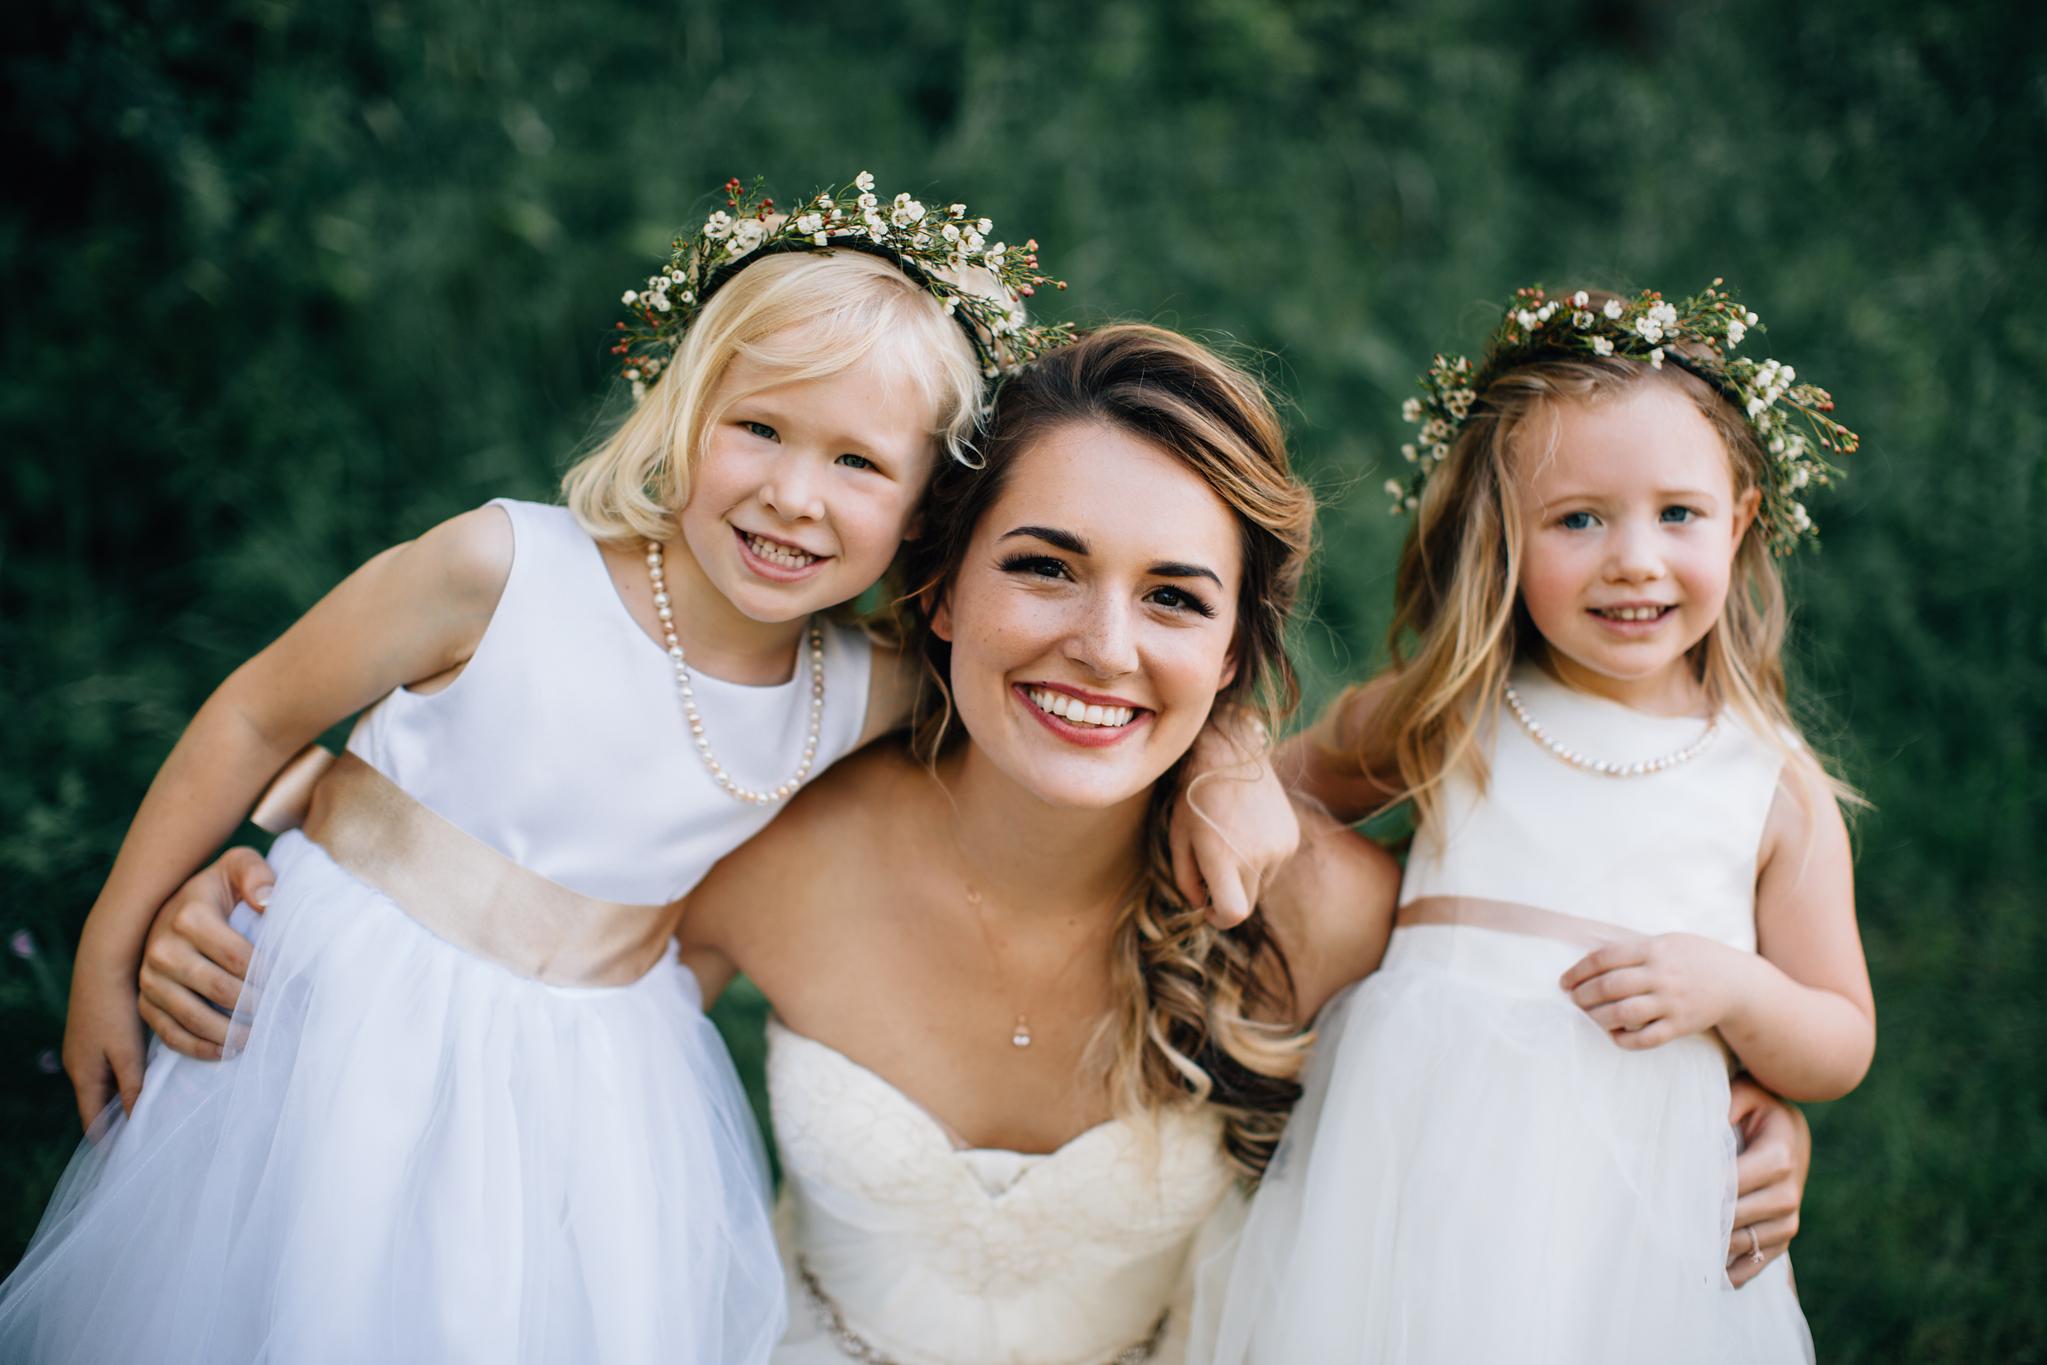 flower girls with flower crowns